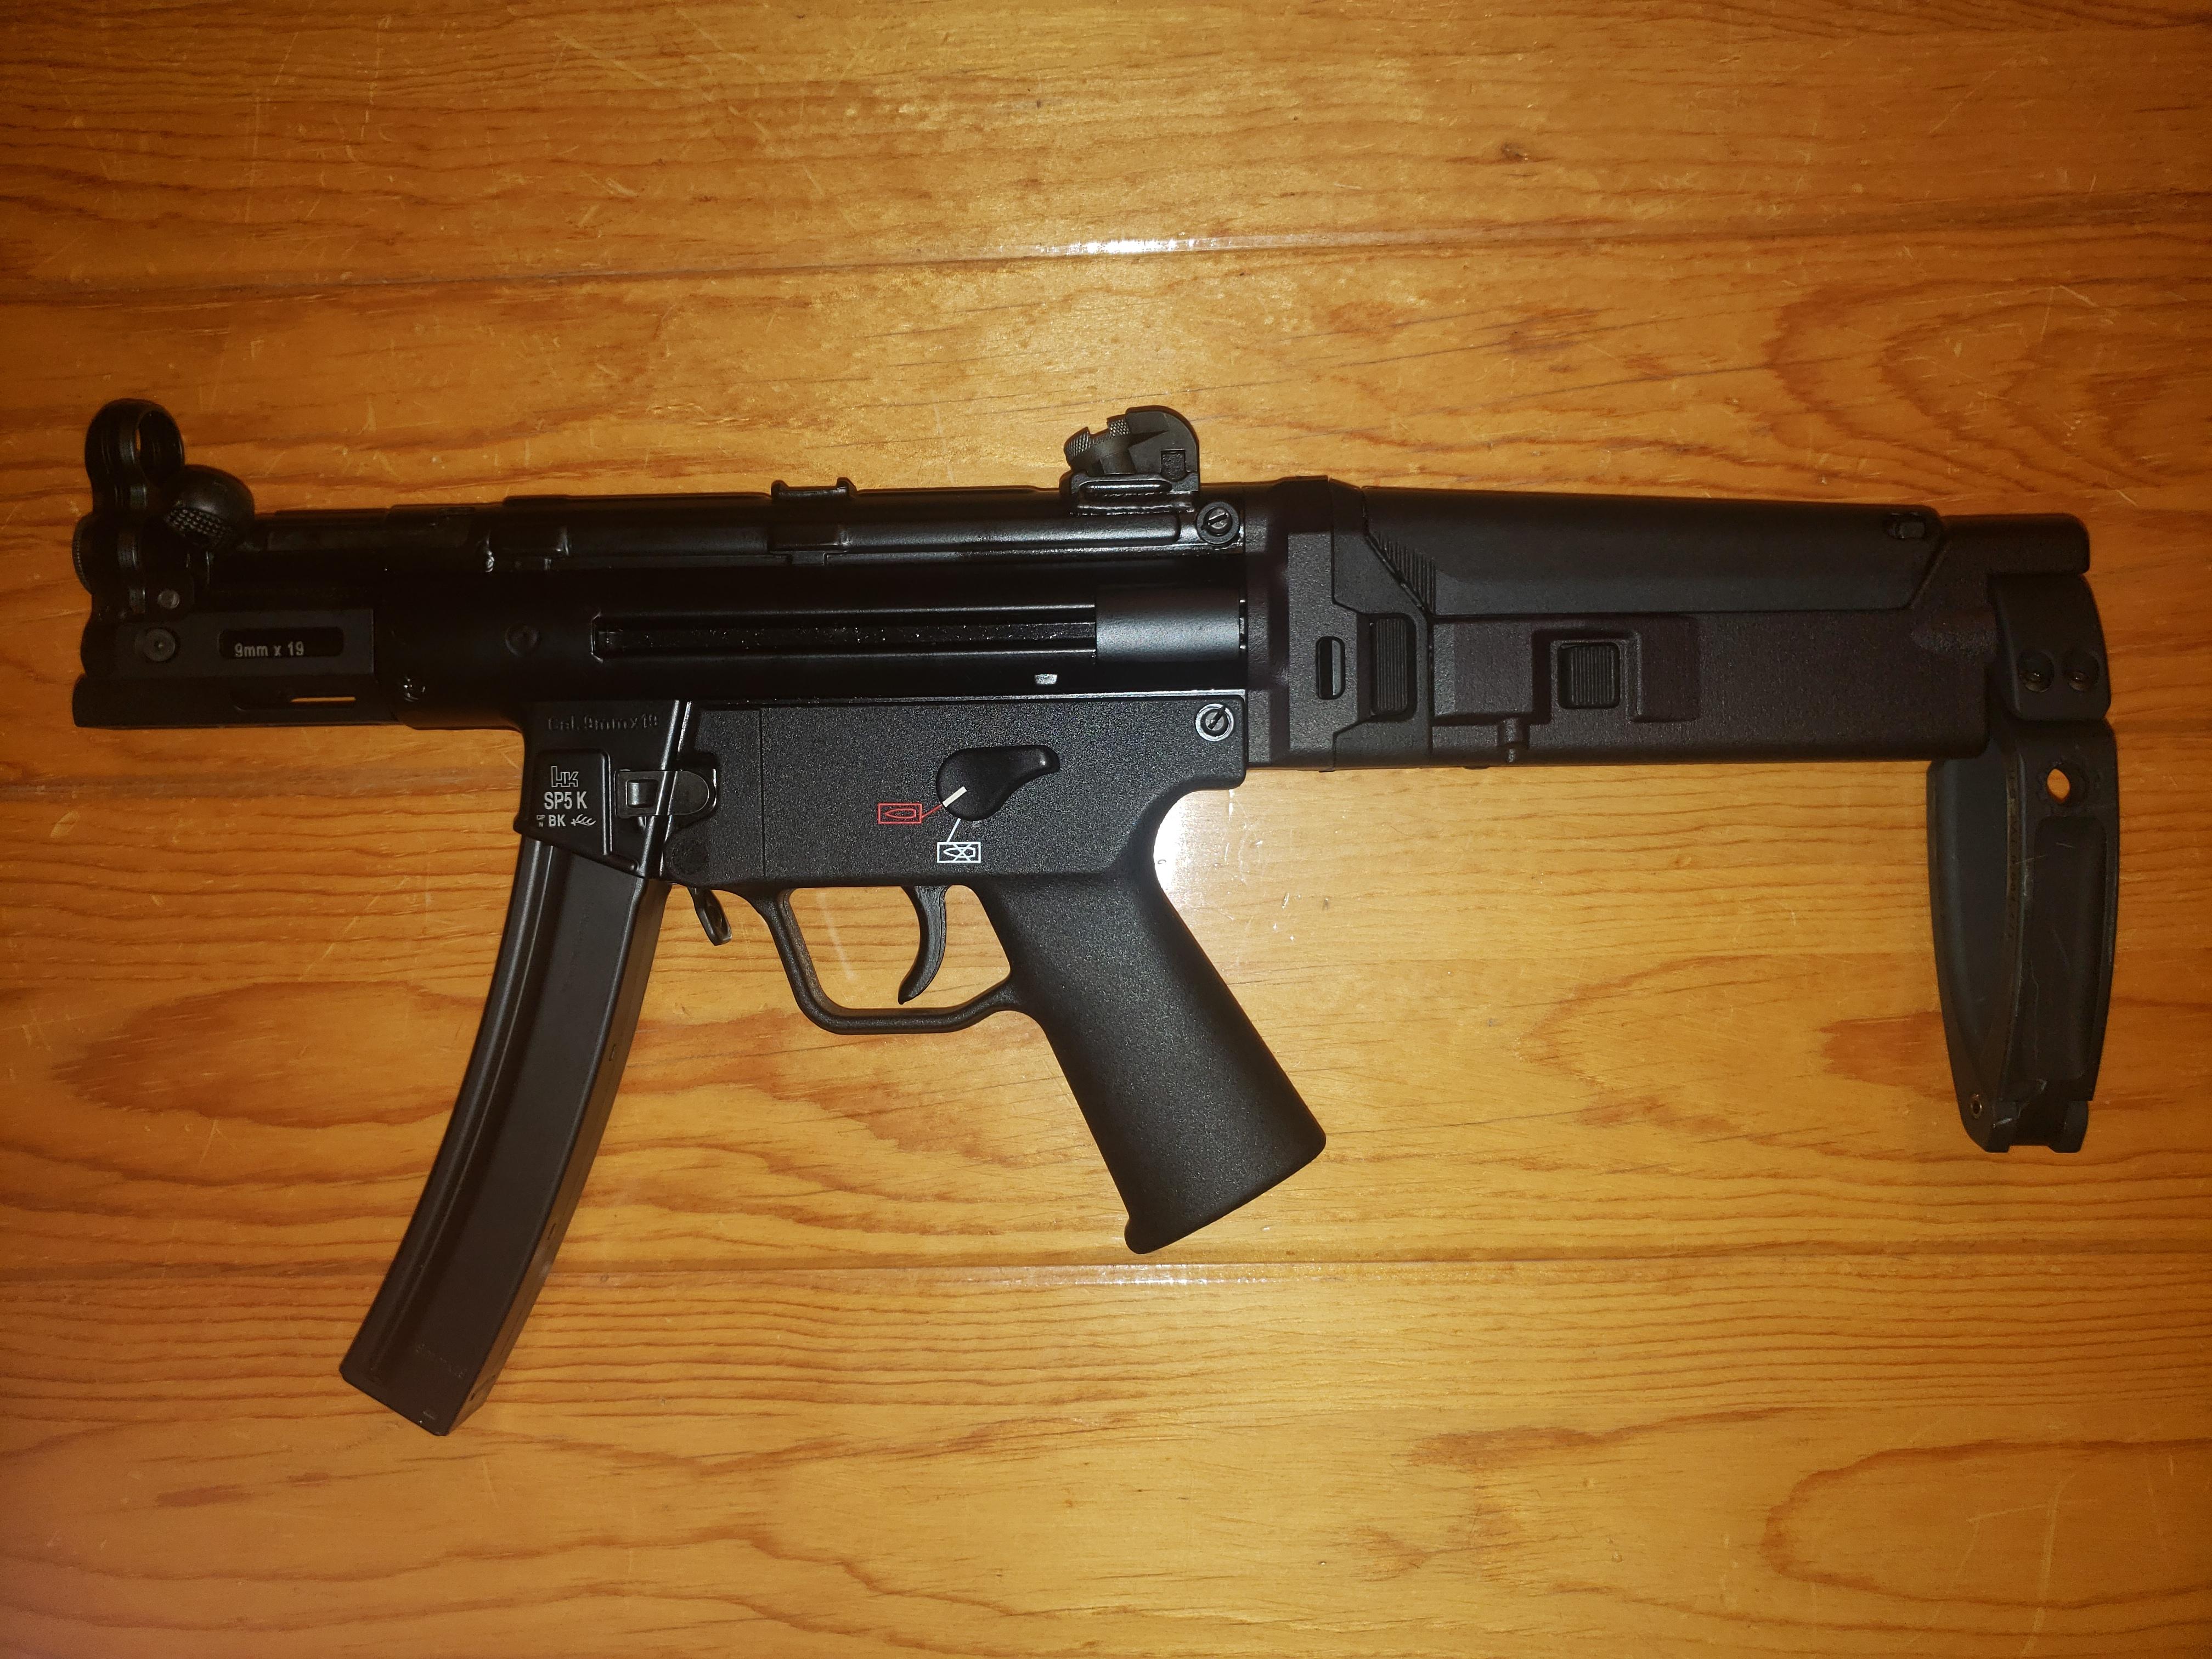 MP5 ACR Stock Adaptors In Production-20200226_182002_1582760043317.jpg